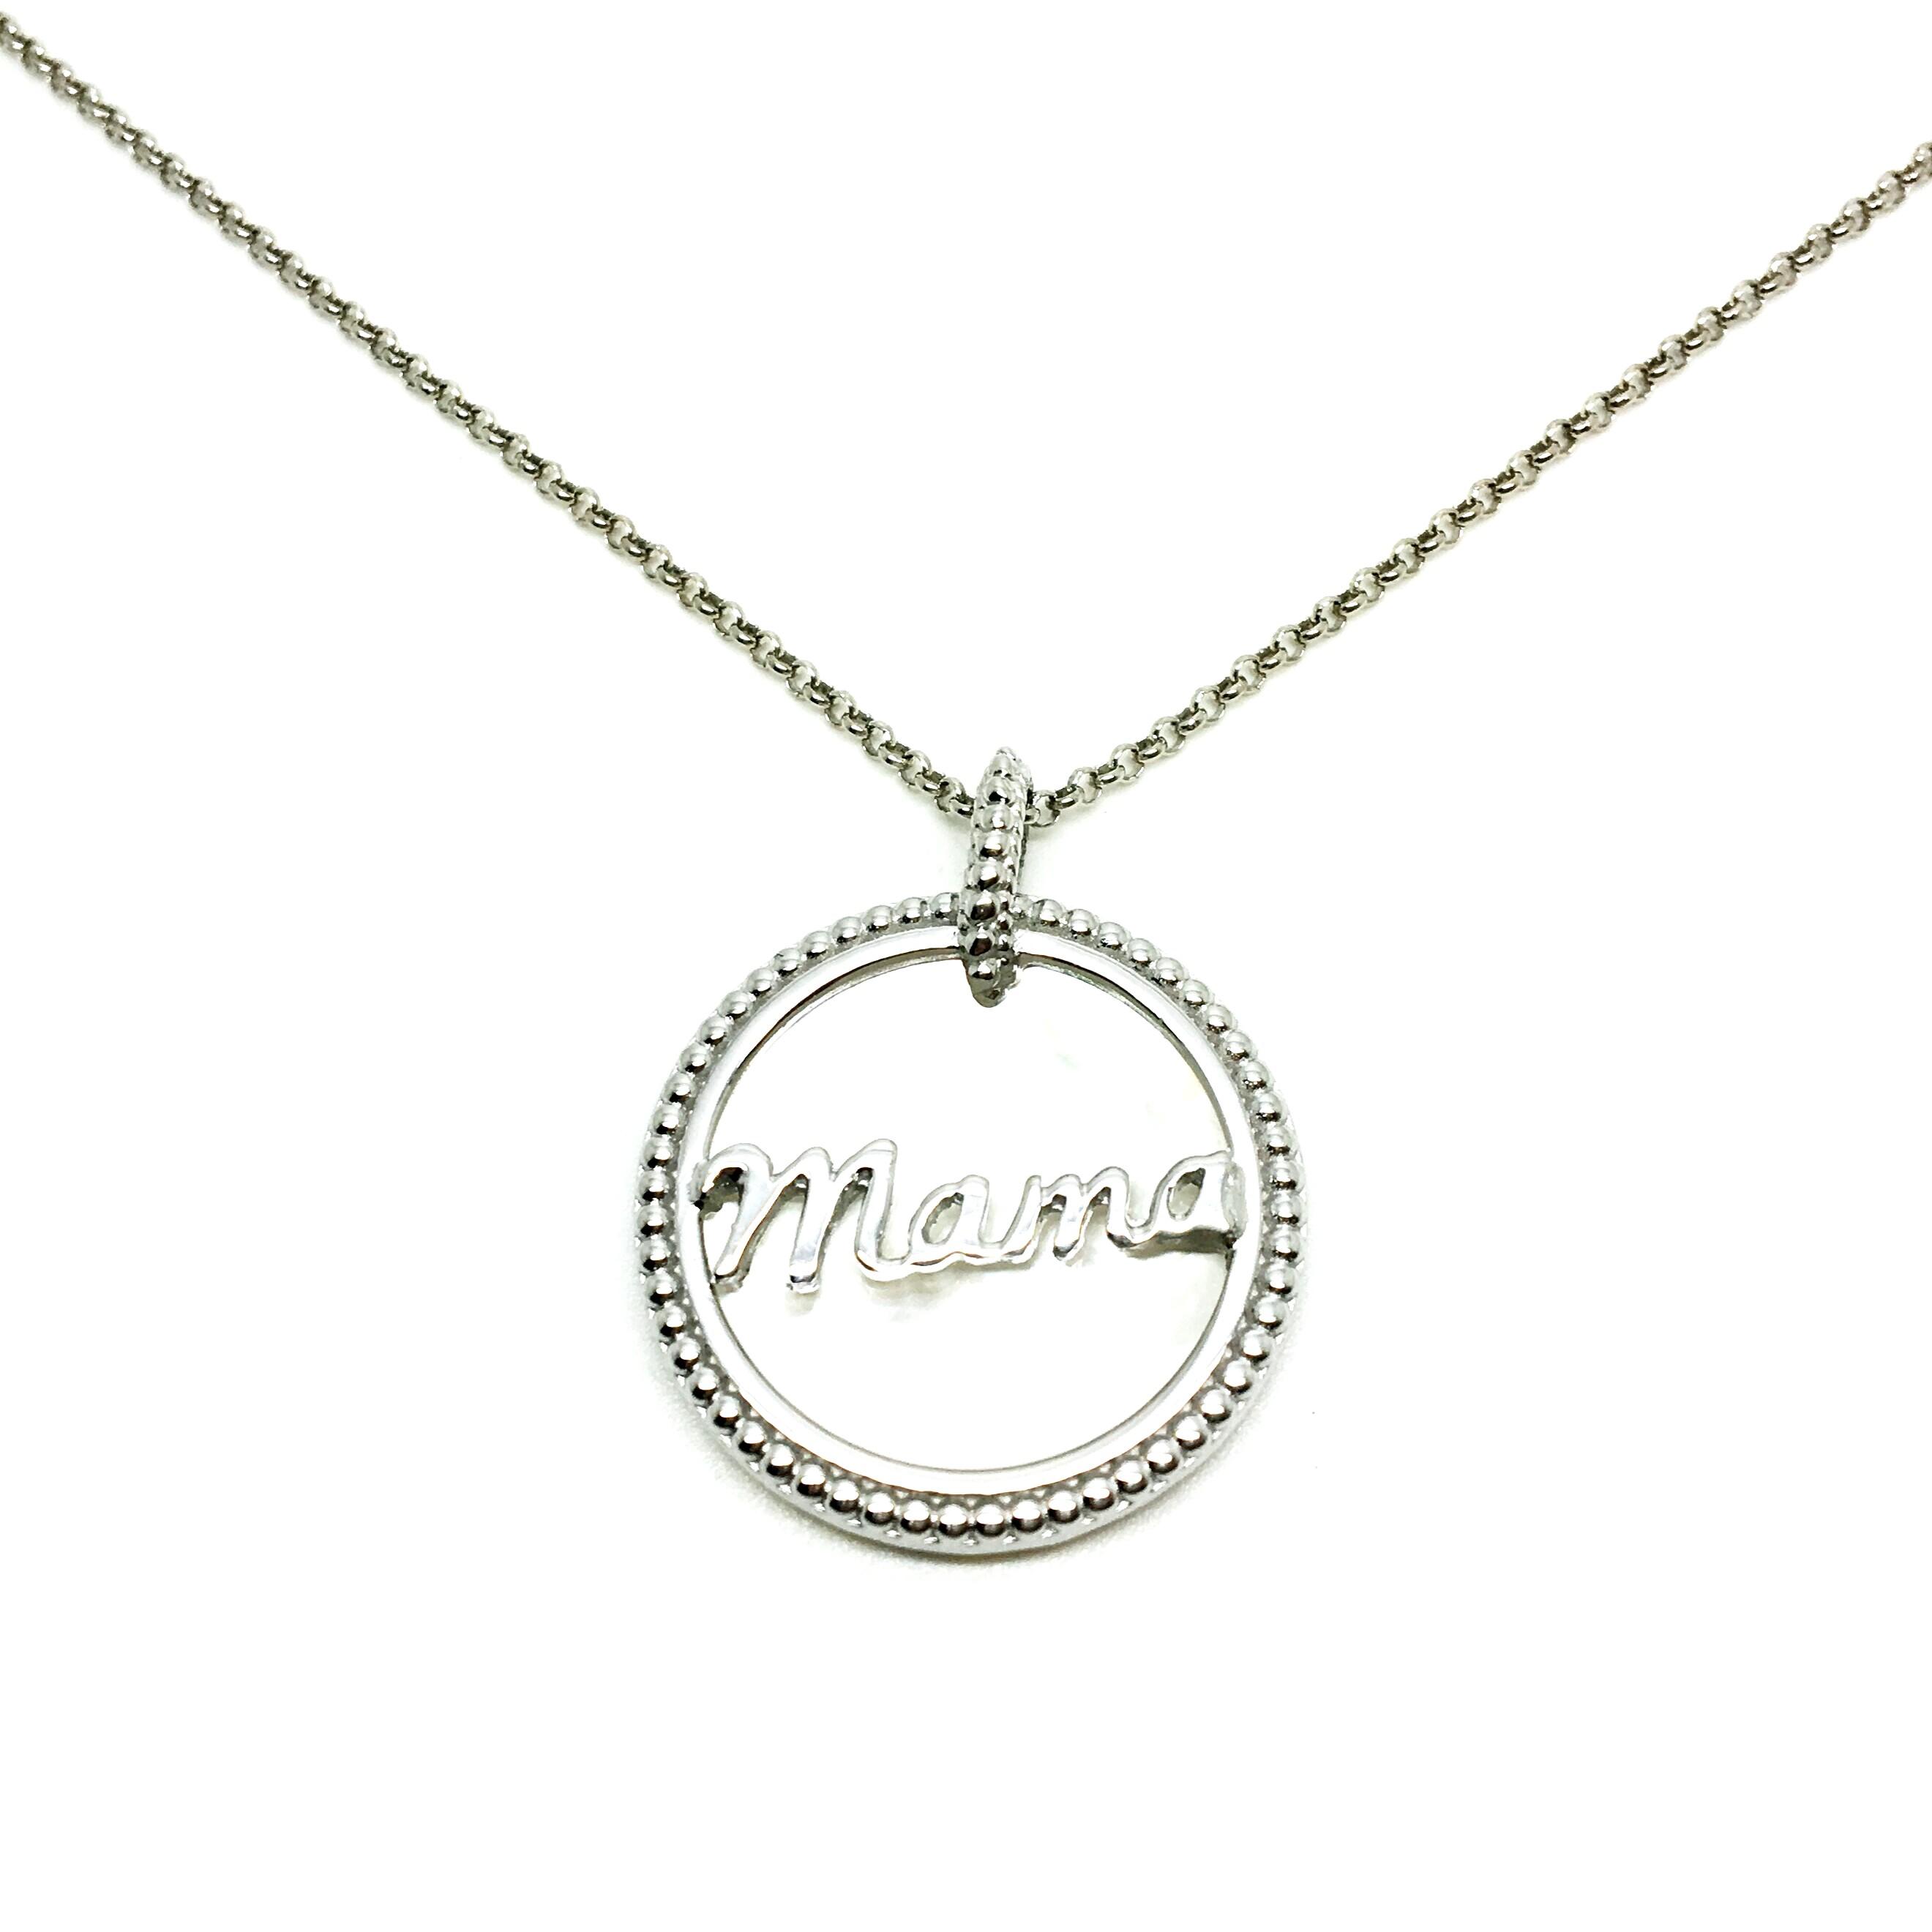 9e3c1317a7c7 gargantilla de plata mama regalo dia de la madre joyería juan luis larráyoz  paplona